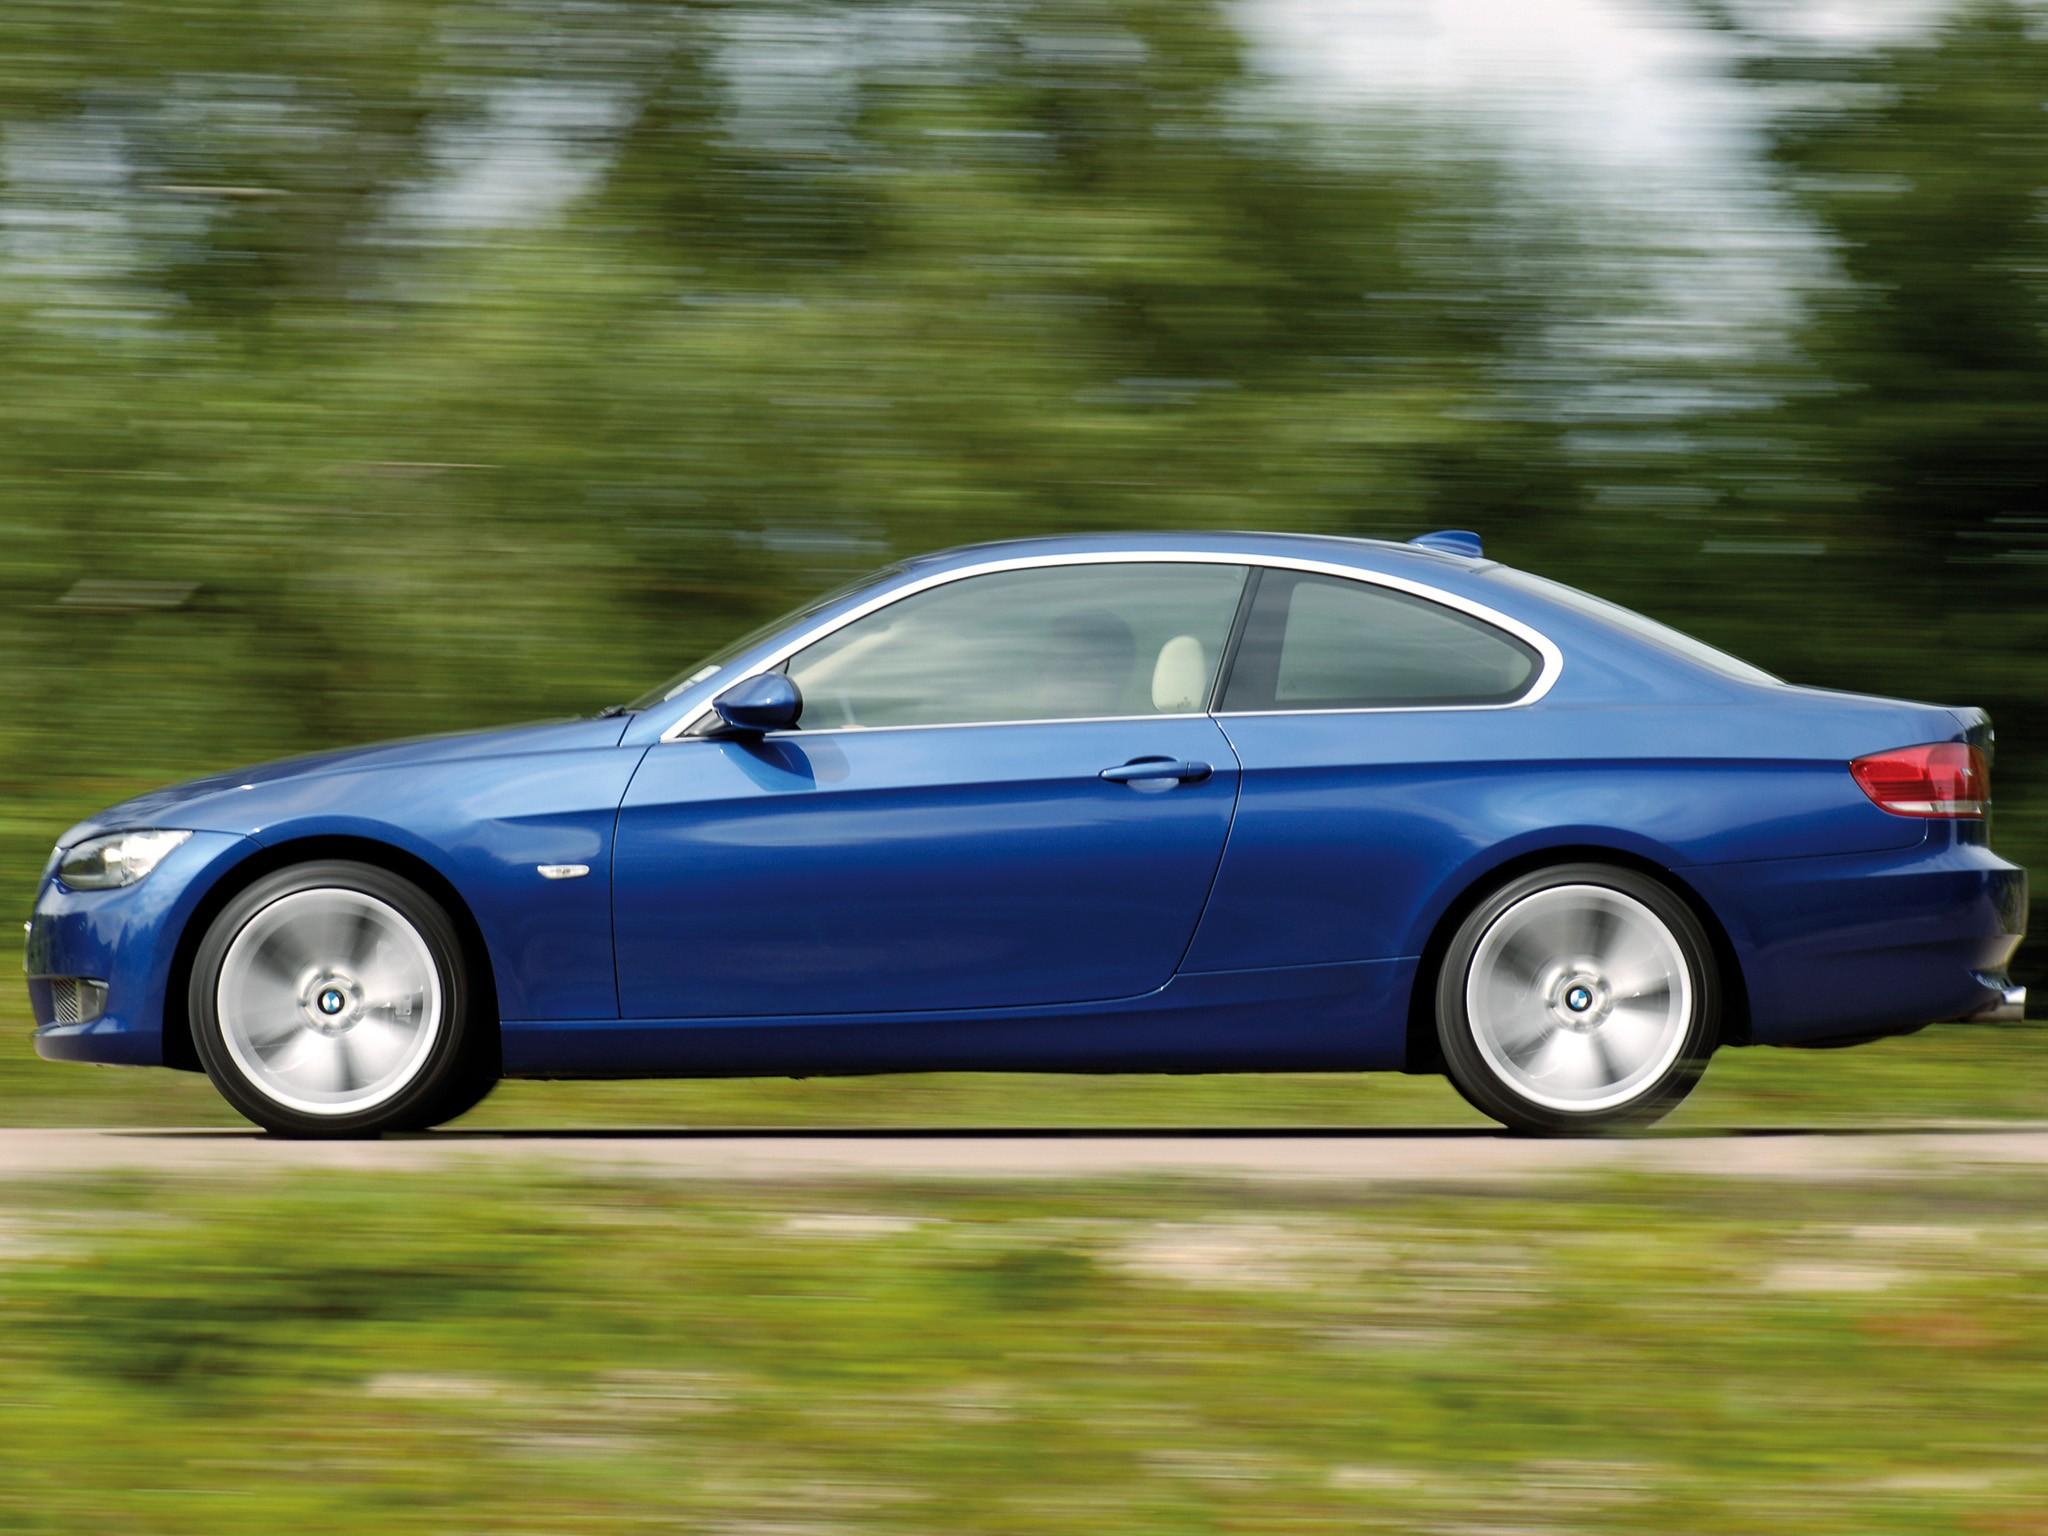 2007 Bmw 335xi >> BMW 3 Series Coupe (E92) specs - 2006, 2007, 2008, 2009 ...